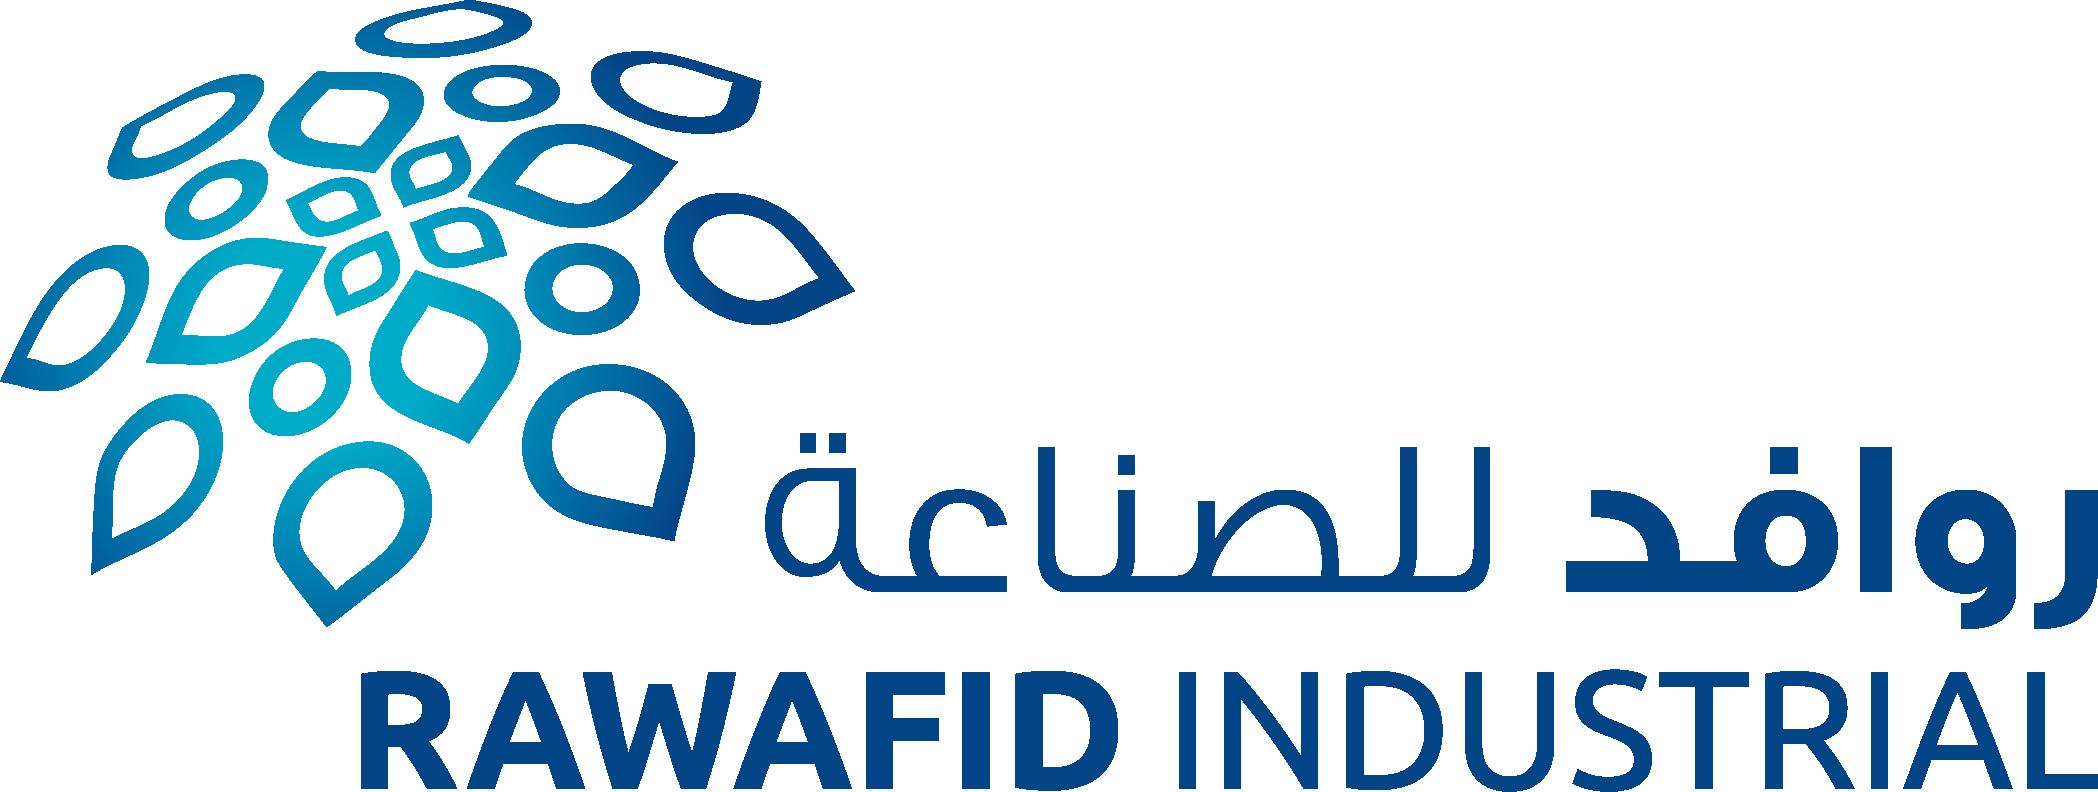 Rawafid Industrial